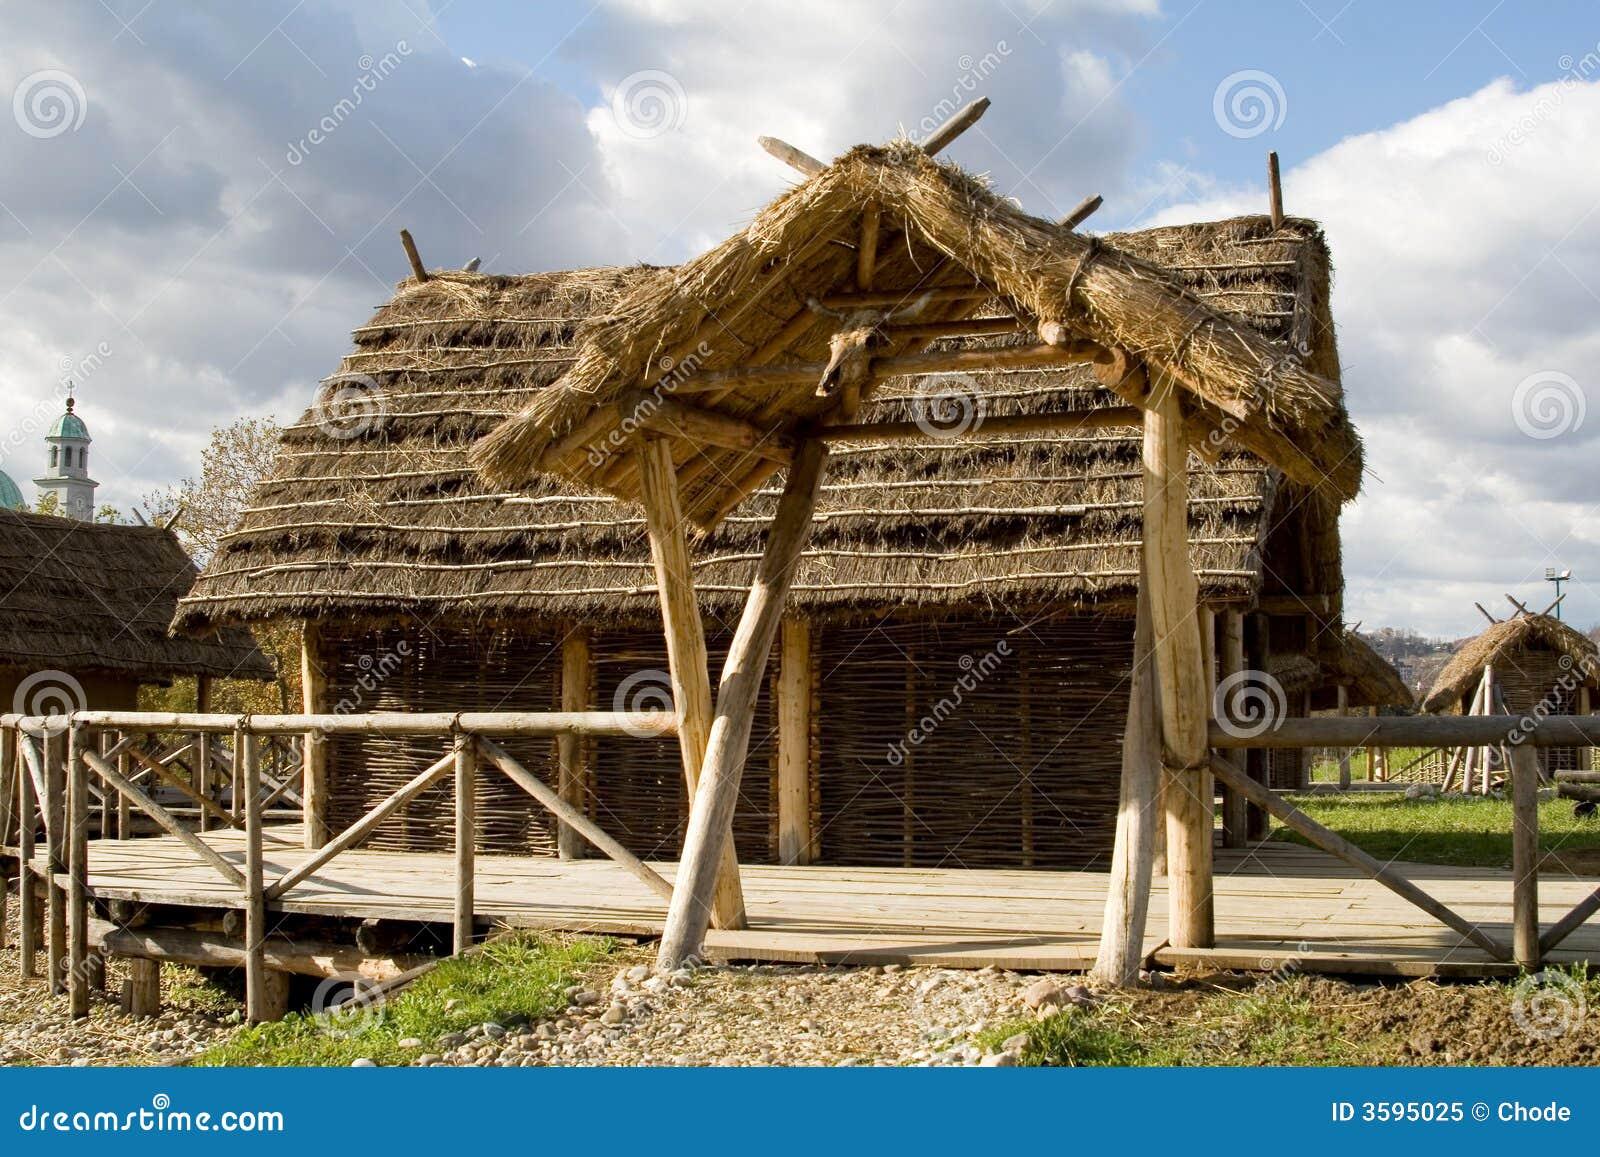 Oud huis stock afbeelding afbeelding bestaande uit traditioneel 3595025 - Oud huis ...